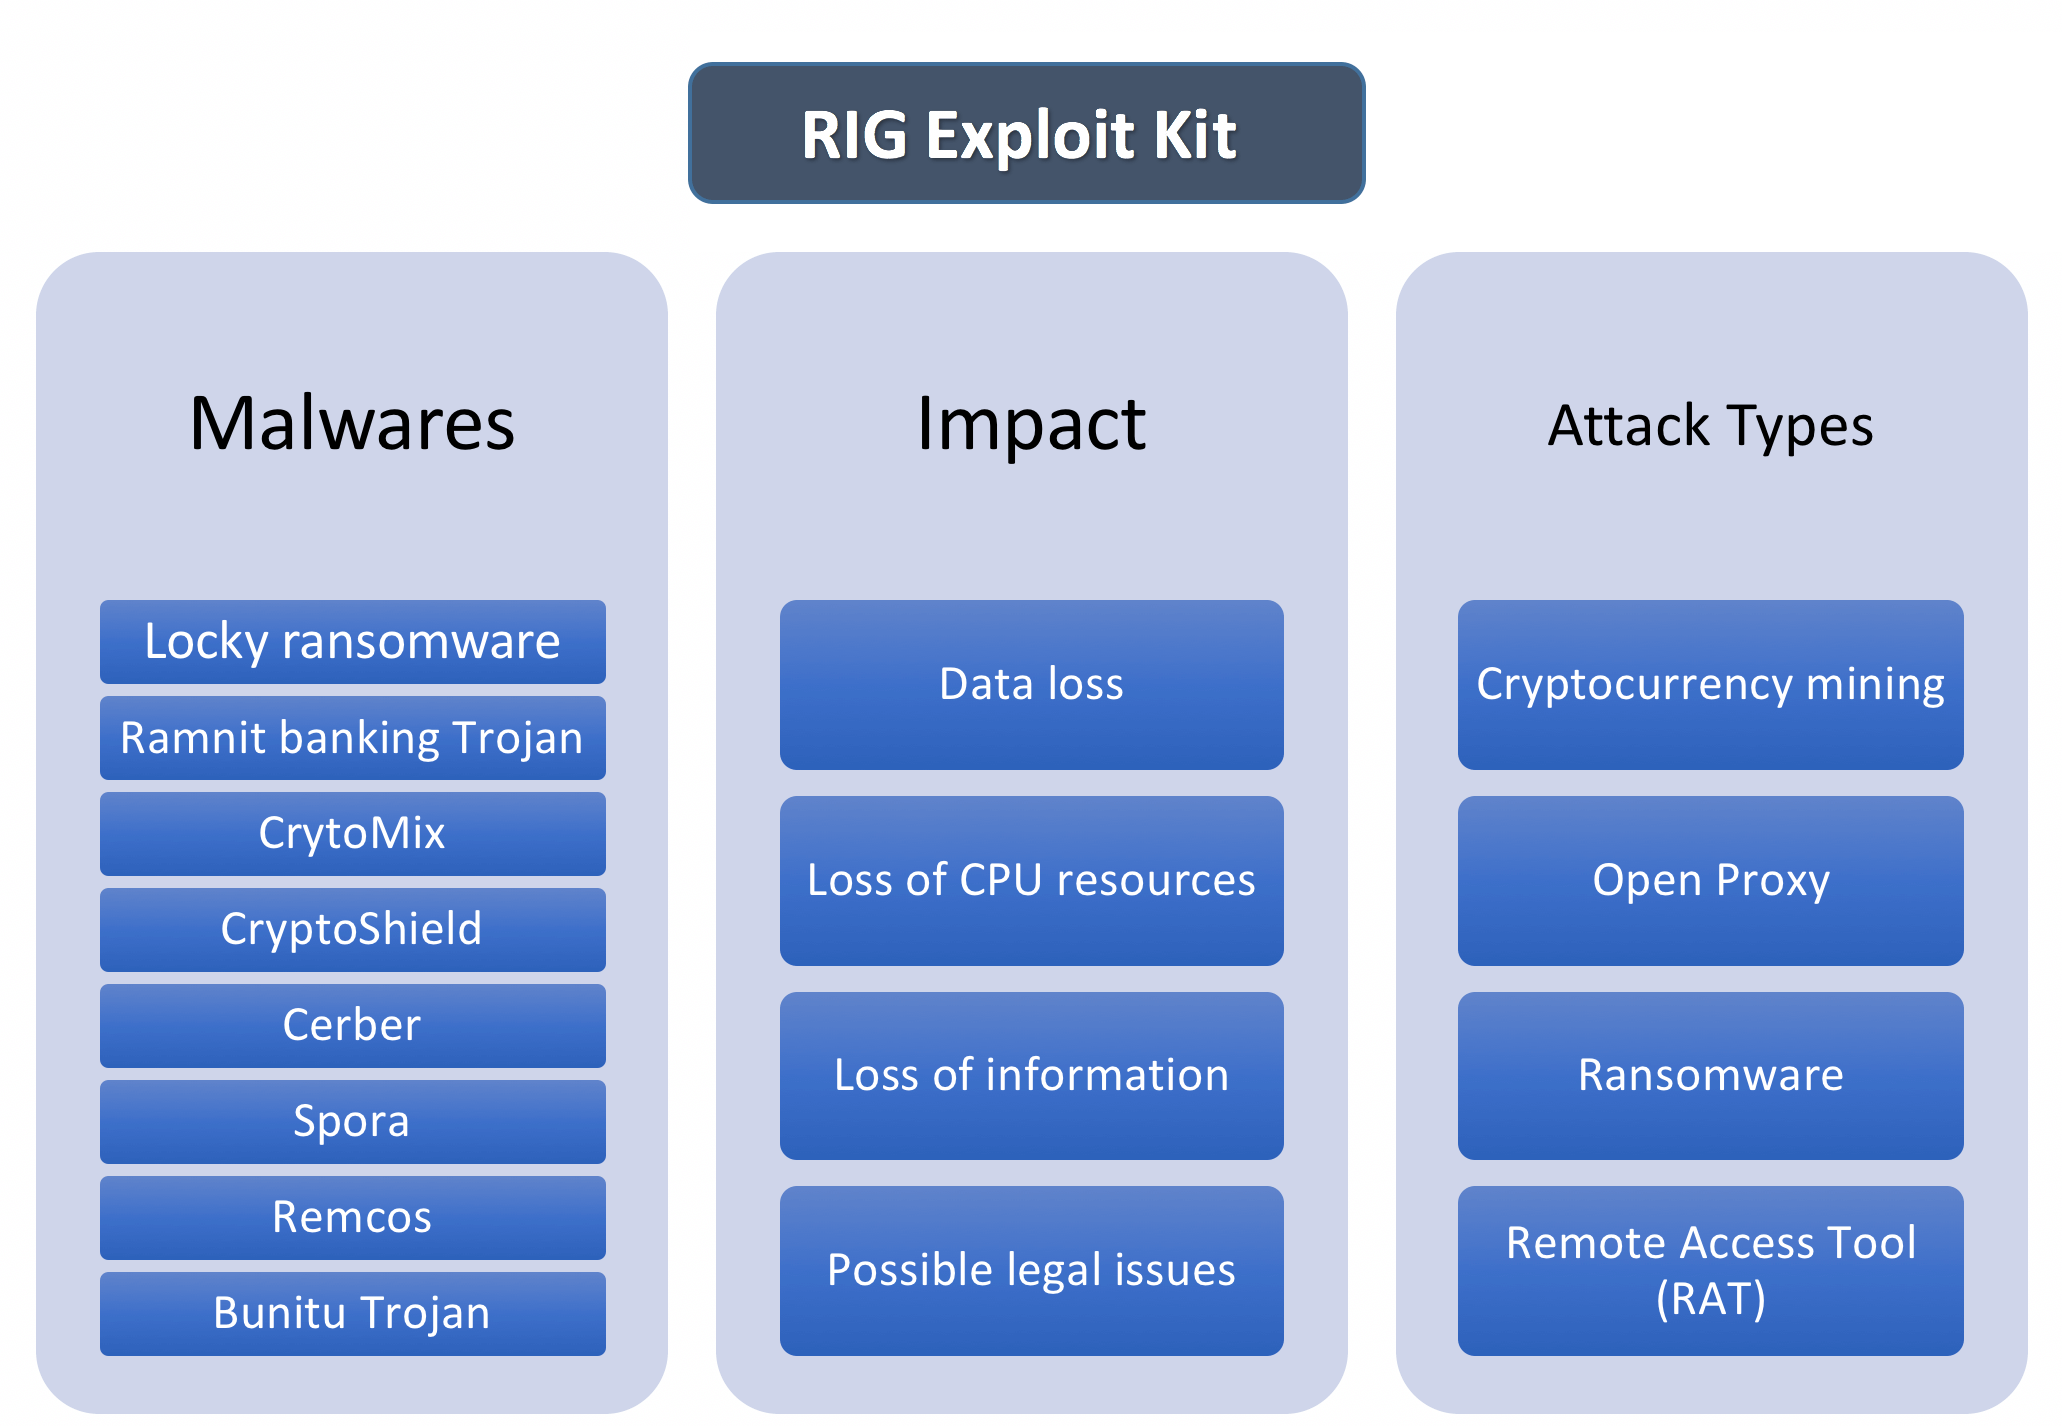 RIG Exploit Kit